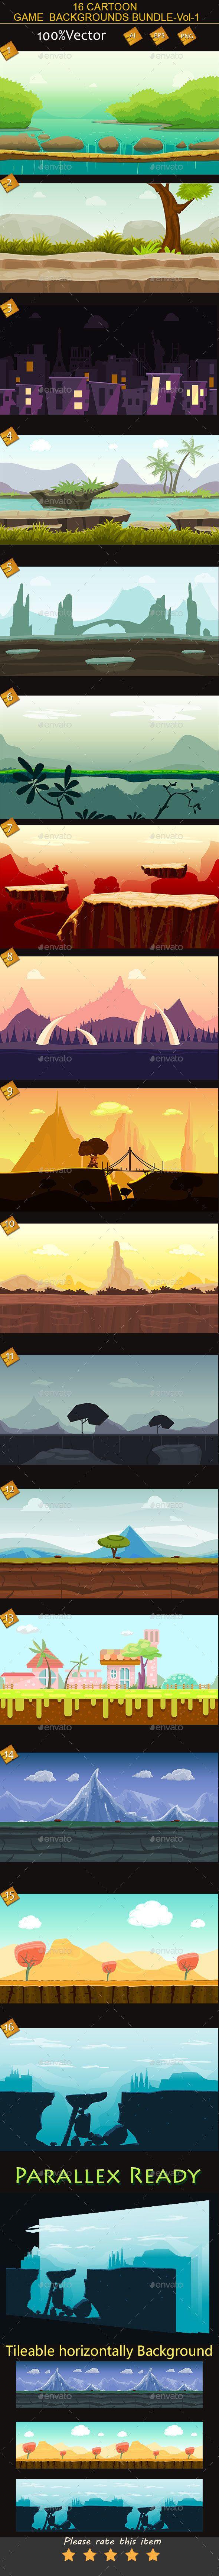 16 cartoon Game Backgrounds Bundle Volume-1 (Backgrounds)